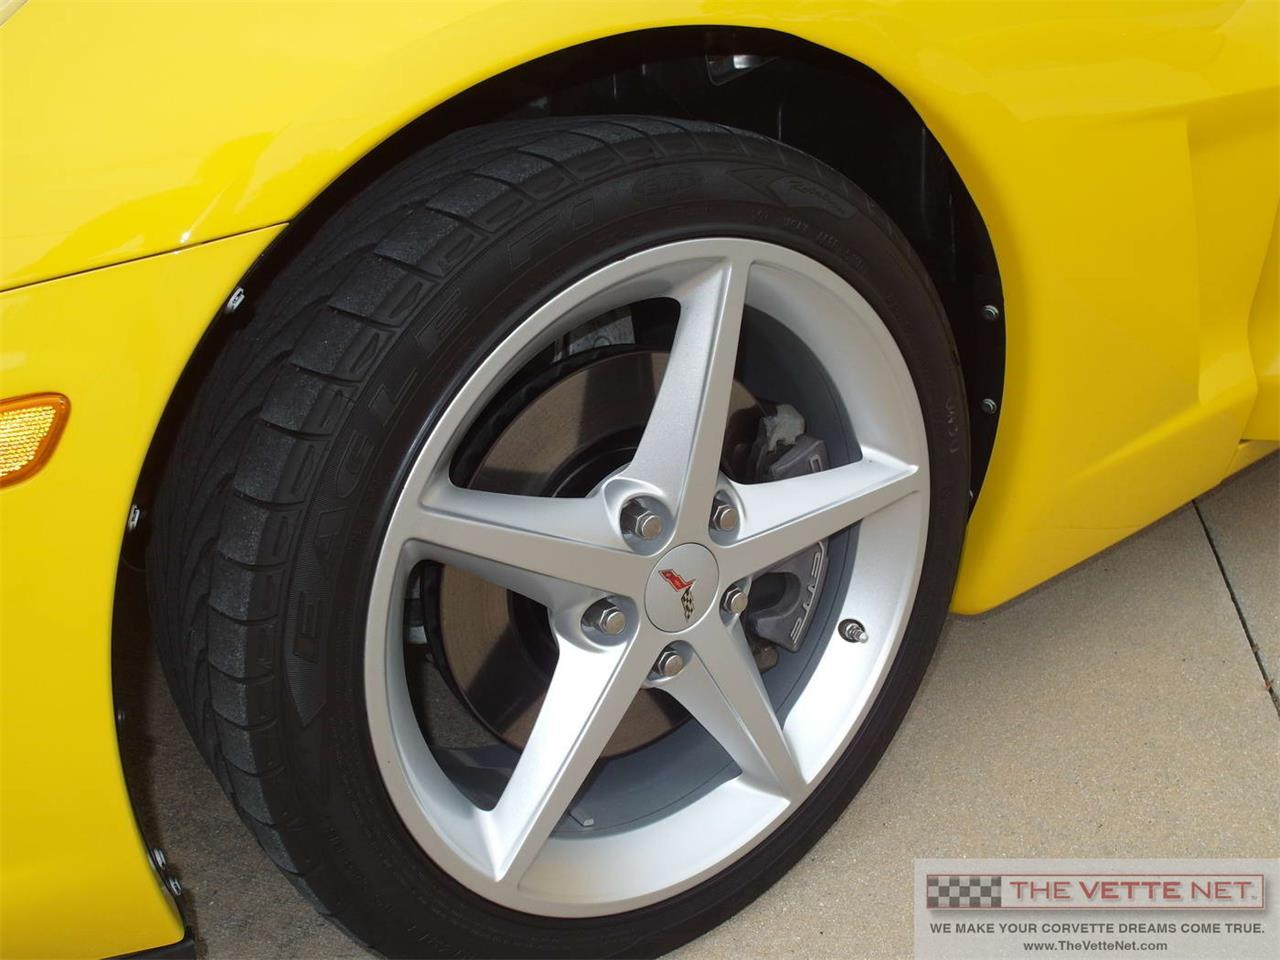 2011 Chevrolet Corvette (CC-874551) for sale in Sarasota, Florida